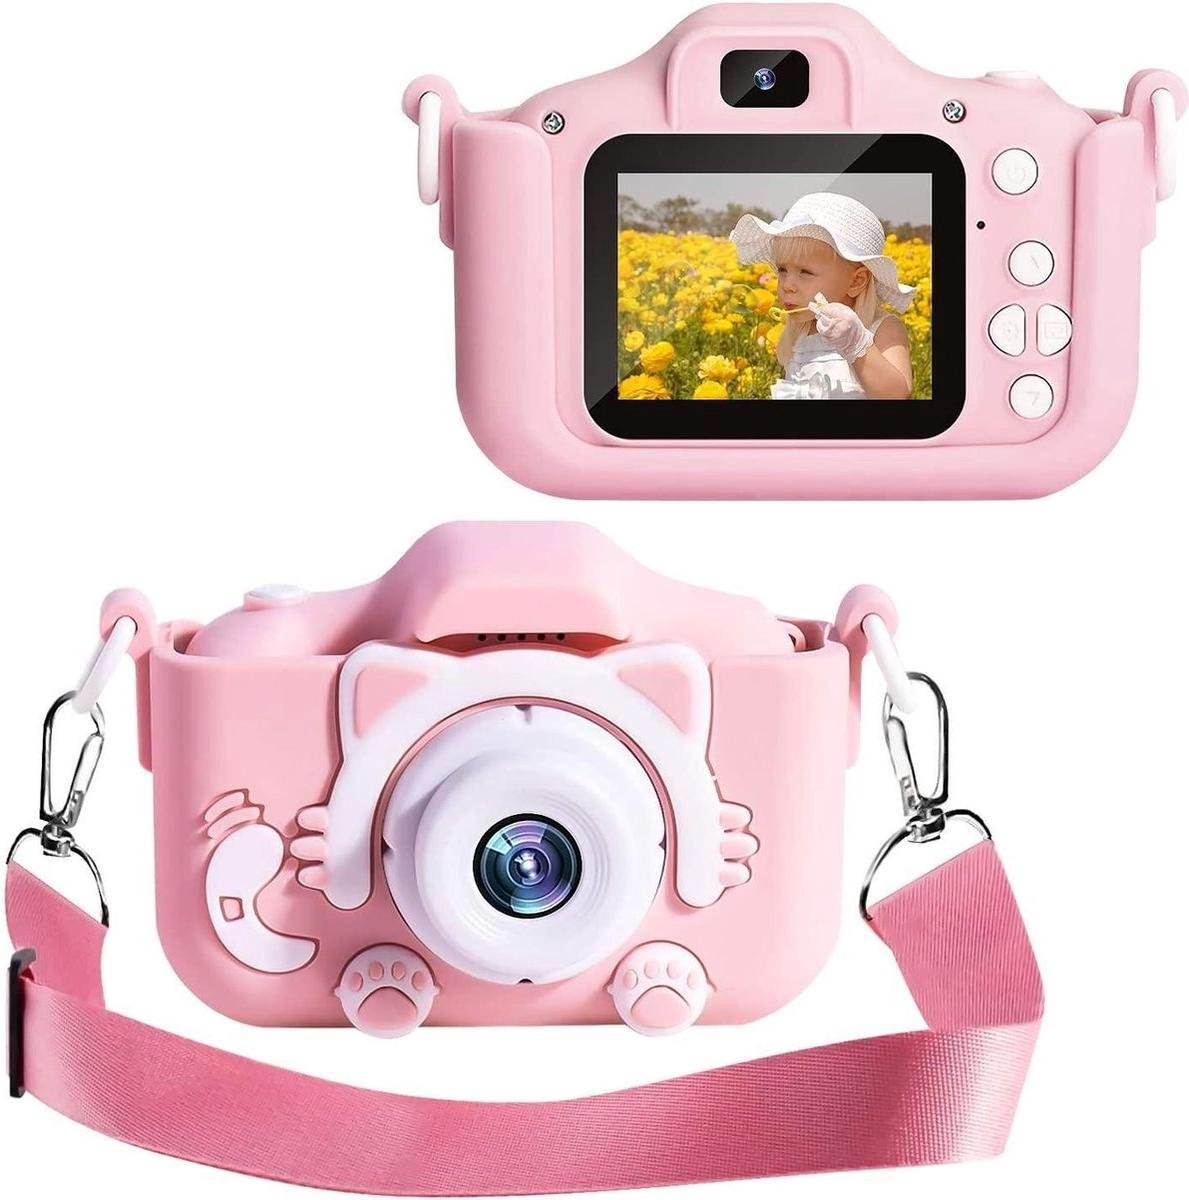 Digitale Kindercamera met 32GB Micro SD Kaart en SD Kaartlezer